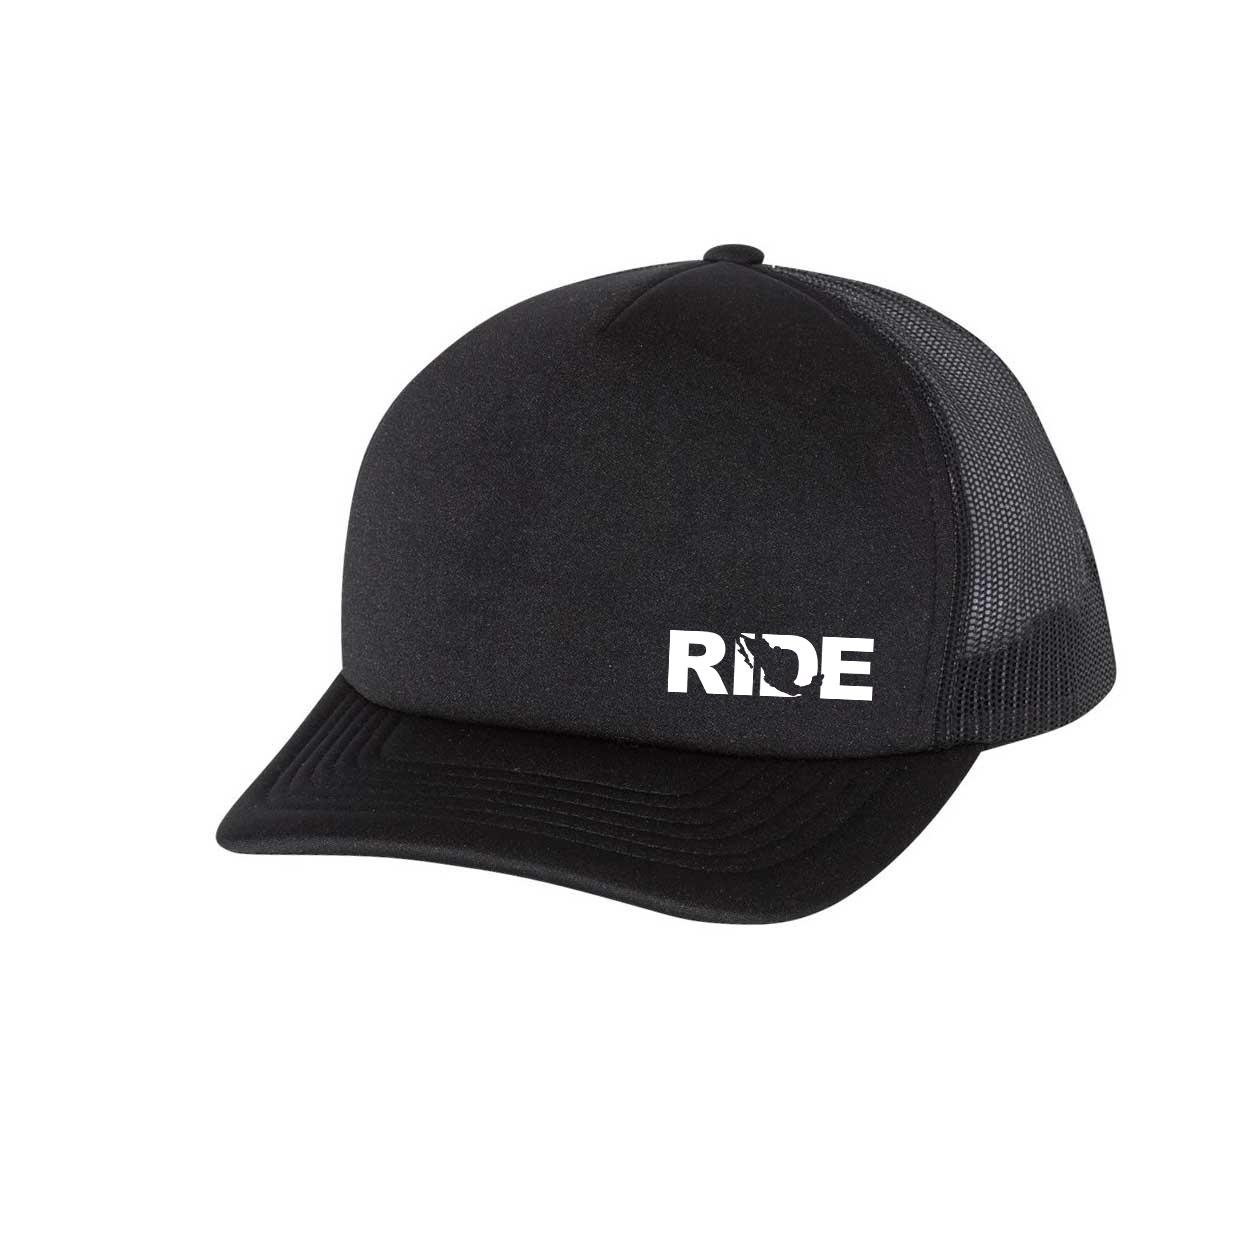 Ride Mexico Night Out Premium Foam Trucker Snapback Hat Black (White Logo)